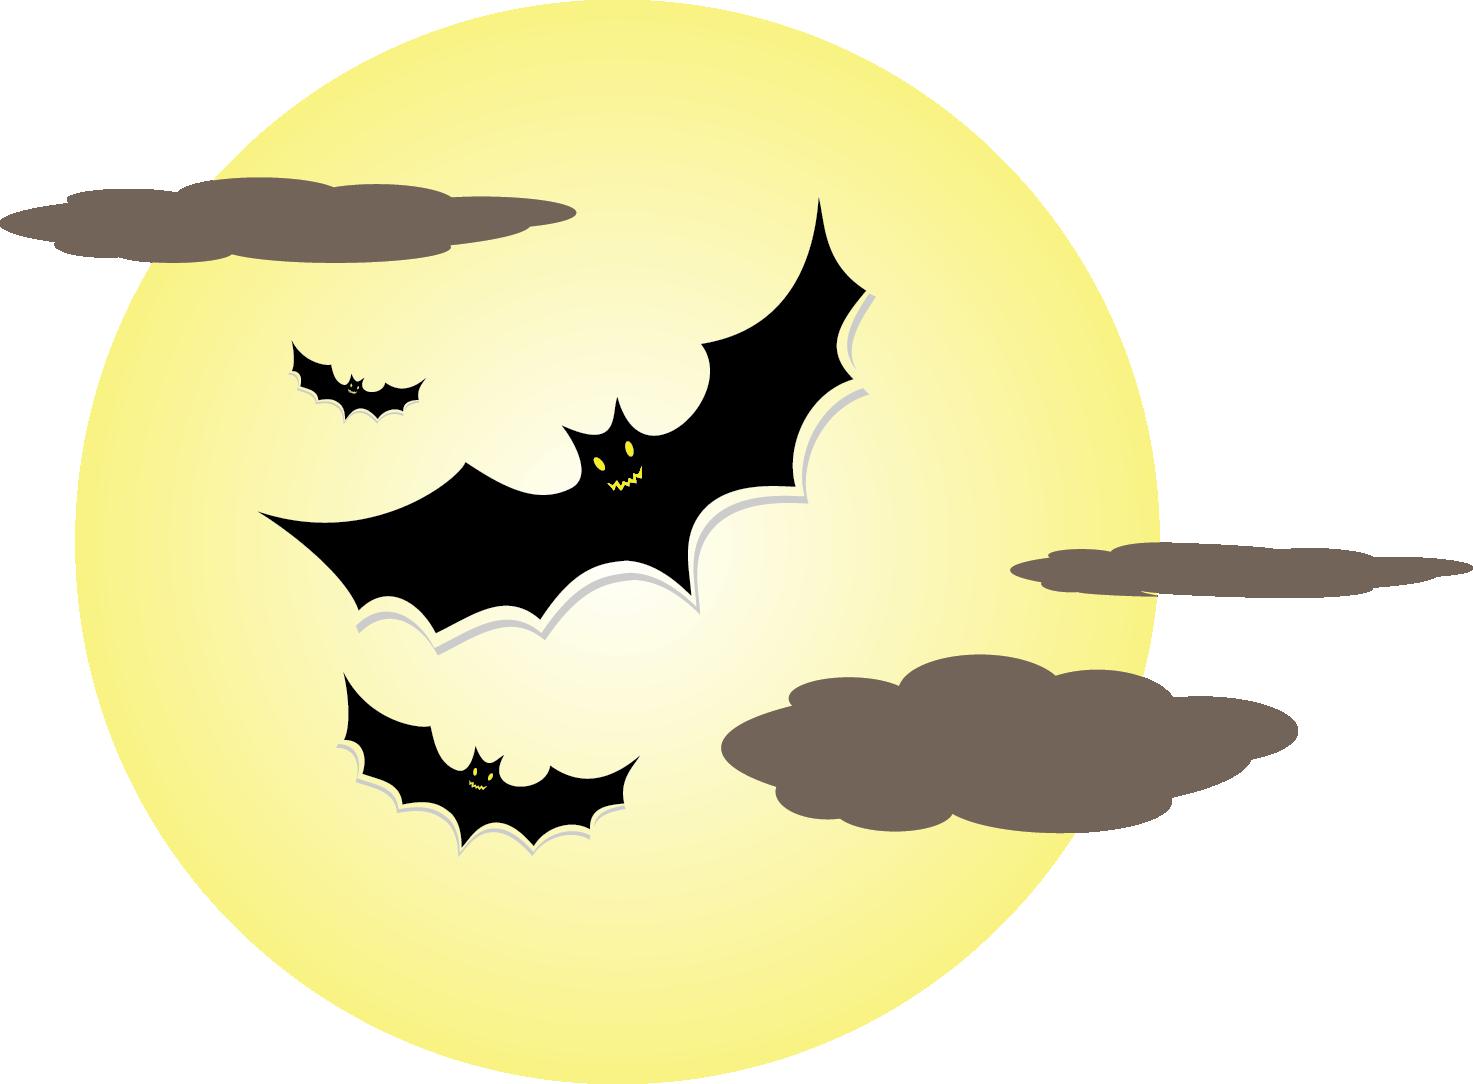 Halloween moon clipart vector freeuse library 28+ Collection of Halloween Moon Clipart | High quality, free ... vector freeuse library